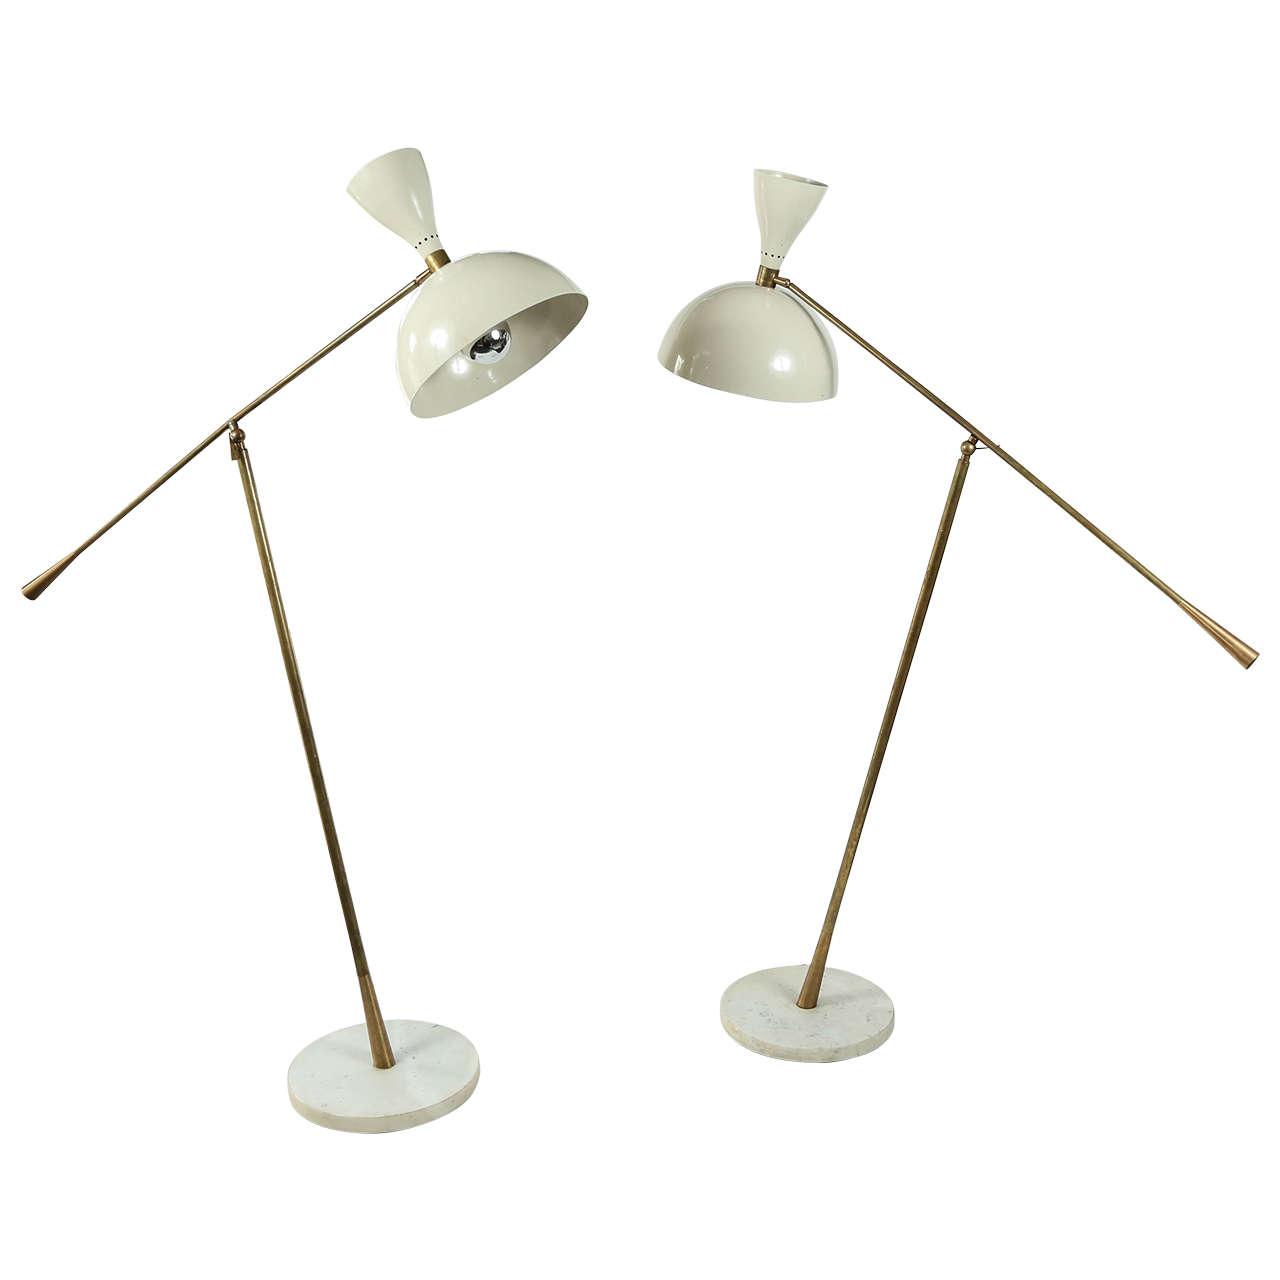 1950s lamps photo - 5